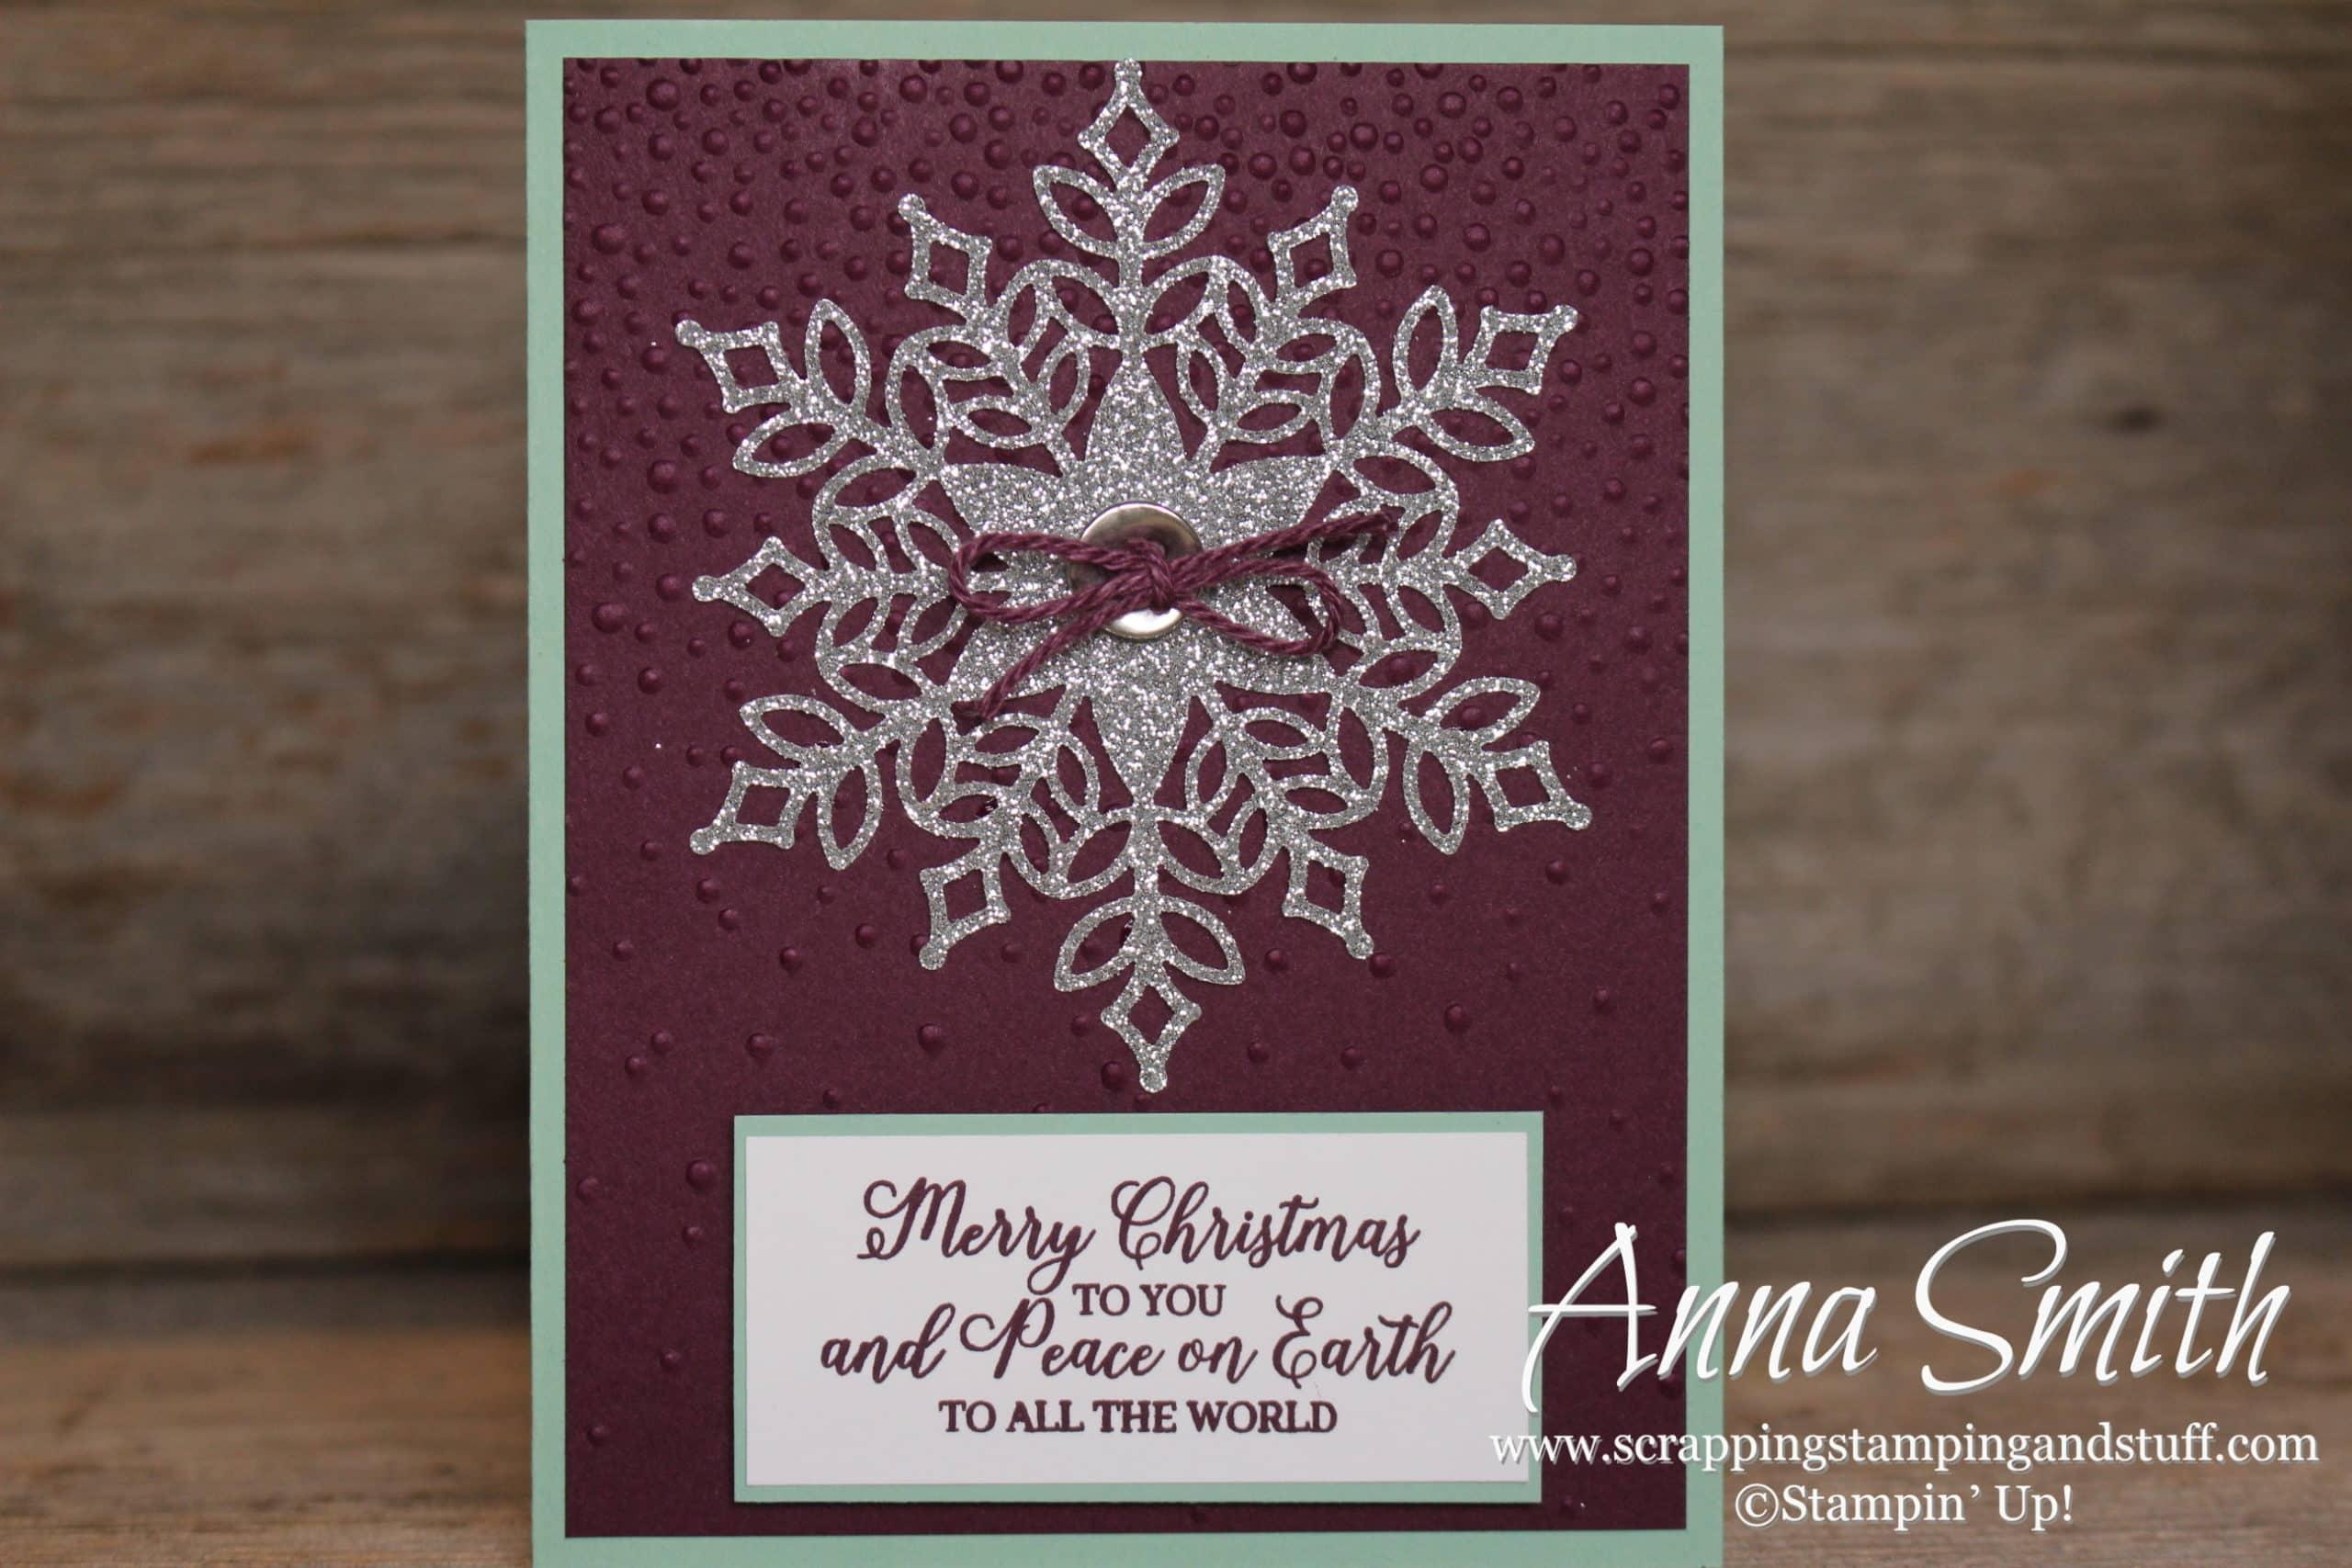 Stampin Up Snowflake Showcase Snow Is Glistening Stamp